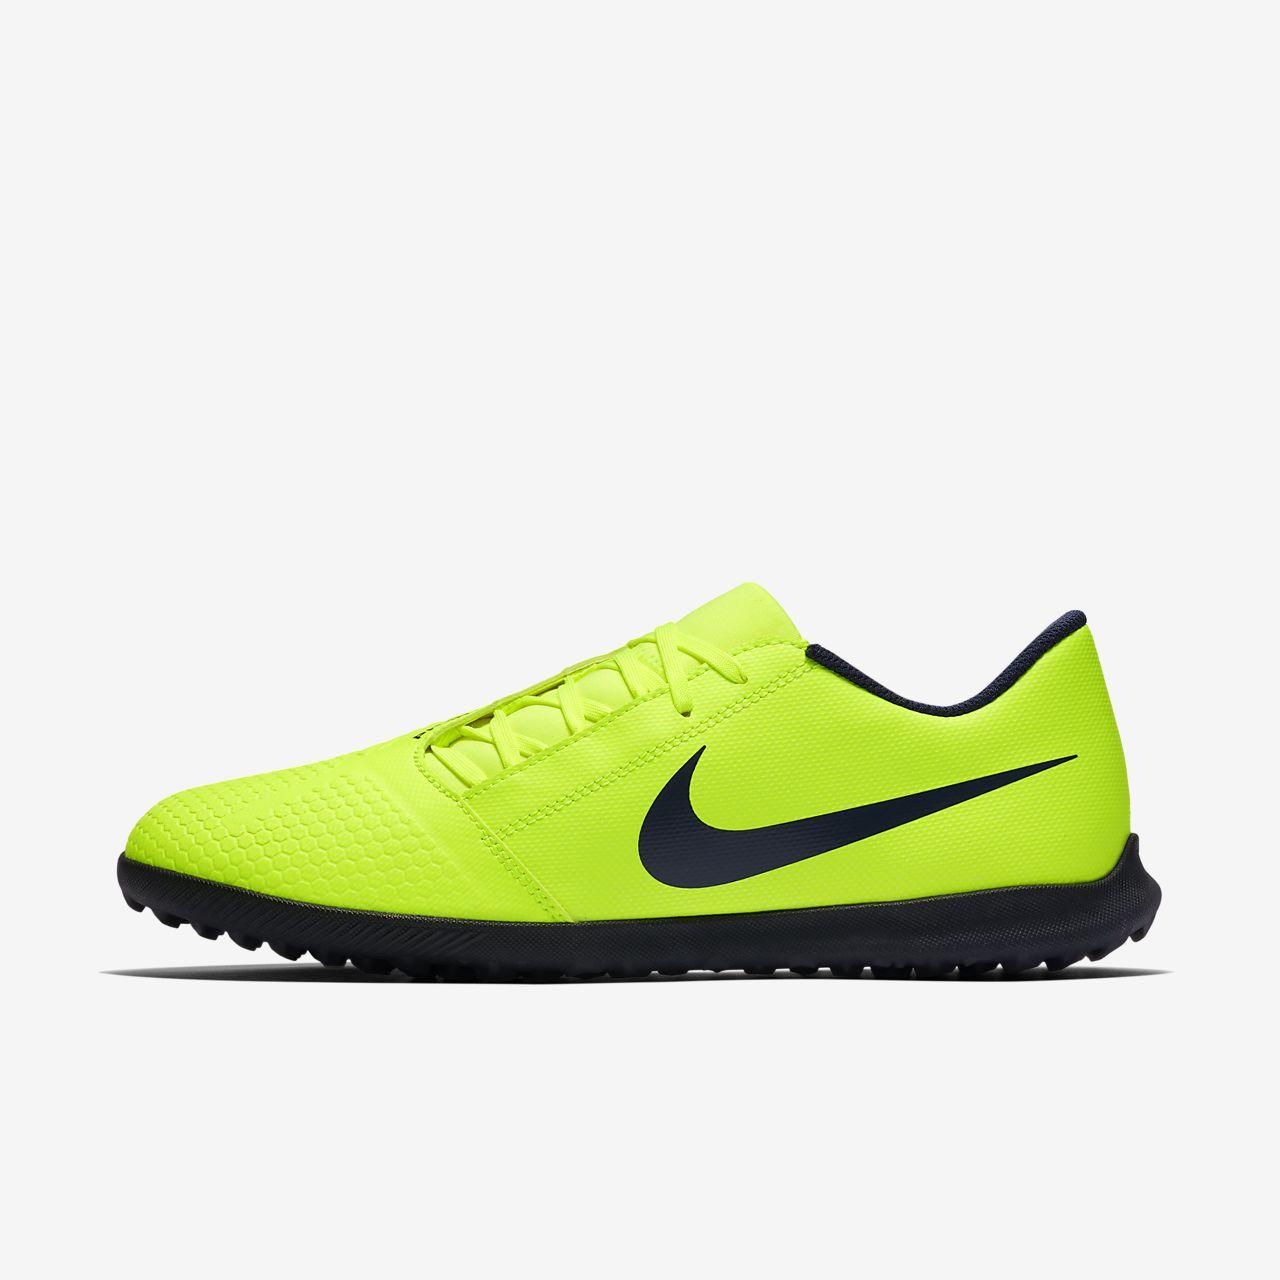 Nike PhantomVNM Club TF Fußballschuh für Turf